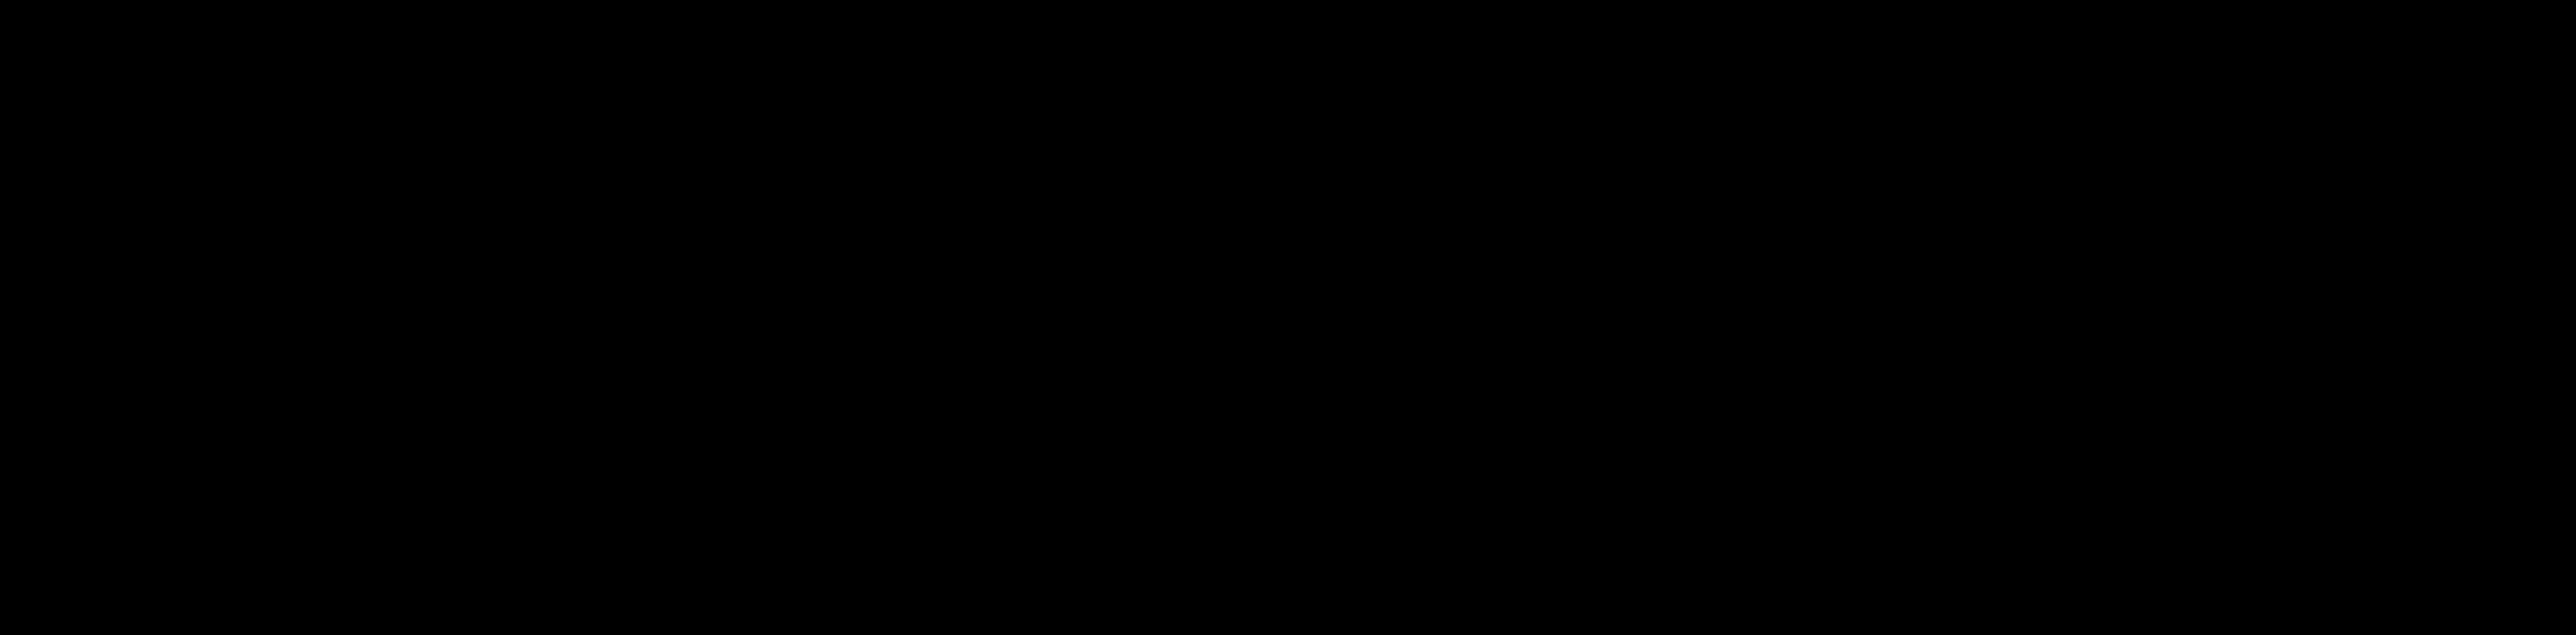 (E)-N-(3-((4-((3-Aminopropyl)amino)butyl)amino)propyl)-3-(2,4,6-tribromo-3-methoxyphenyl)acrylamidetrifluoroacetate (1:3)